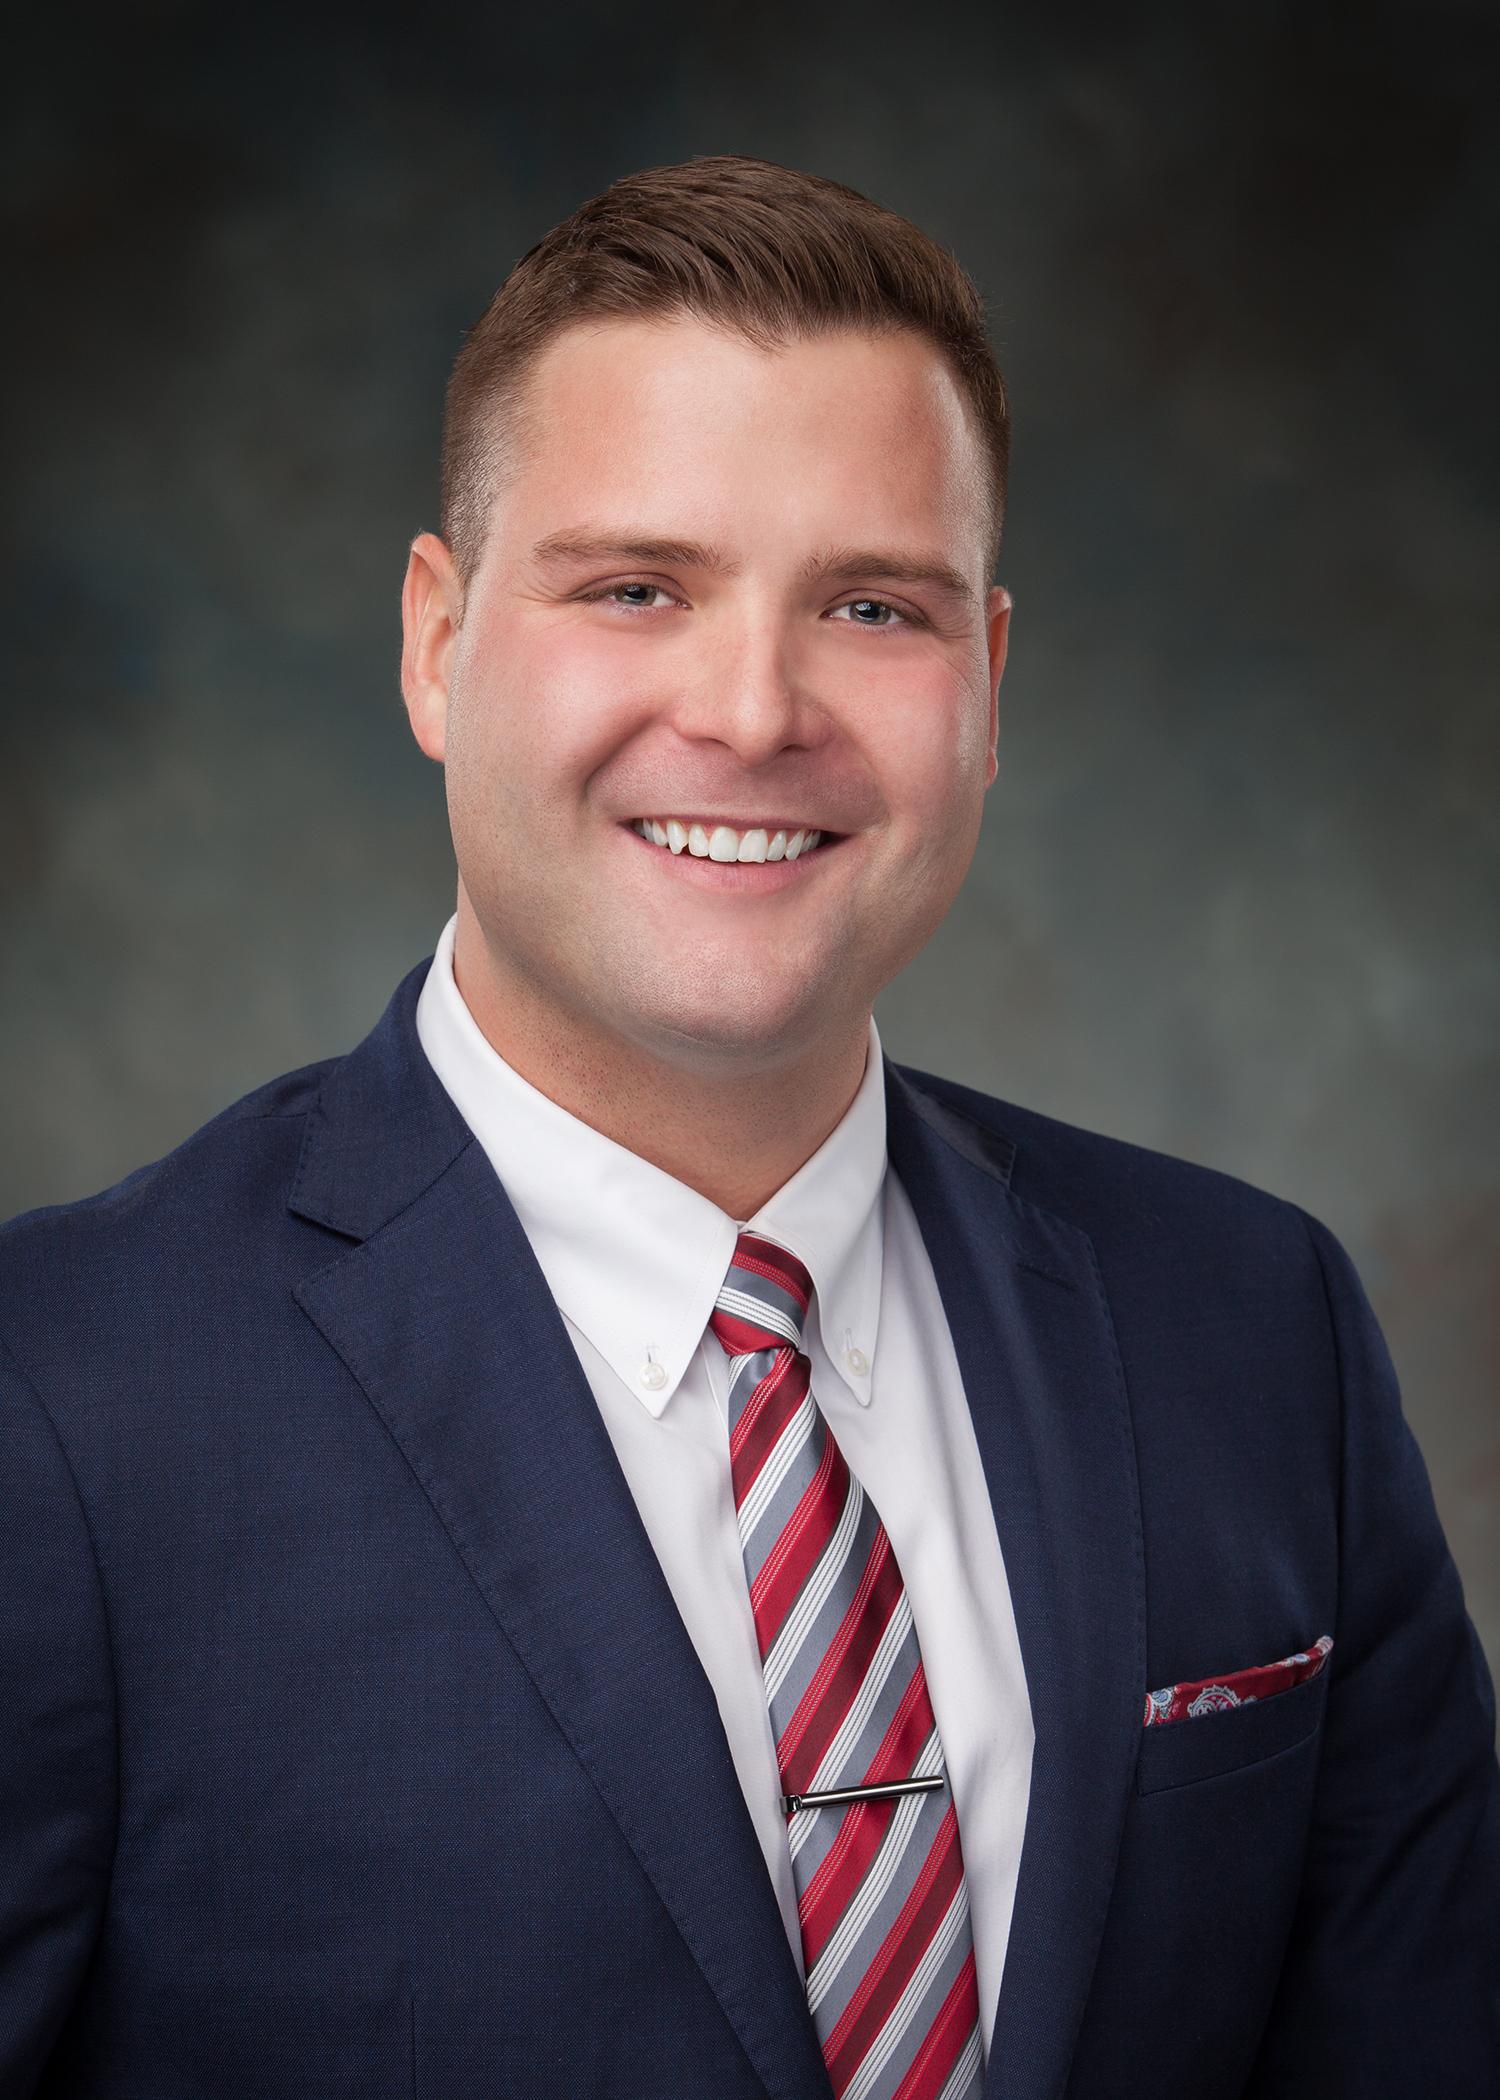 Austin Fox - Business Insurance Agent in Oklahoma City, OK ...